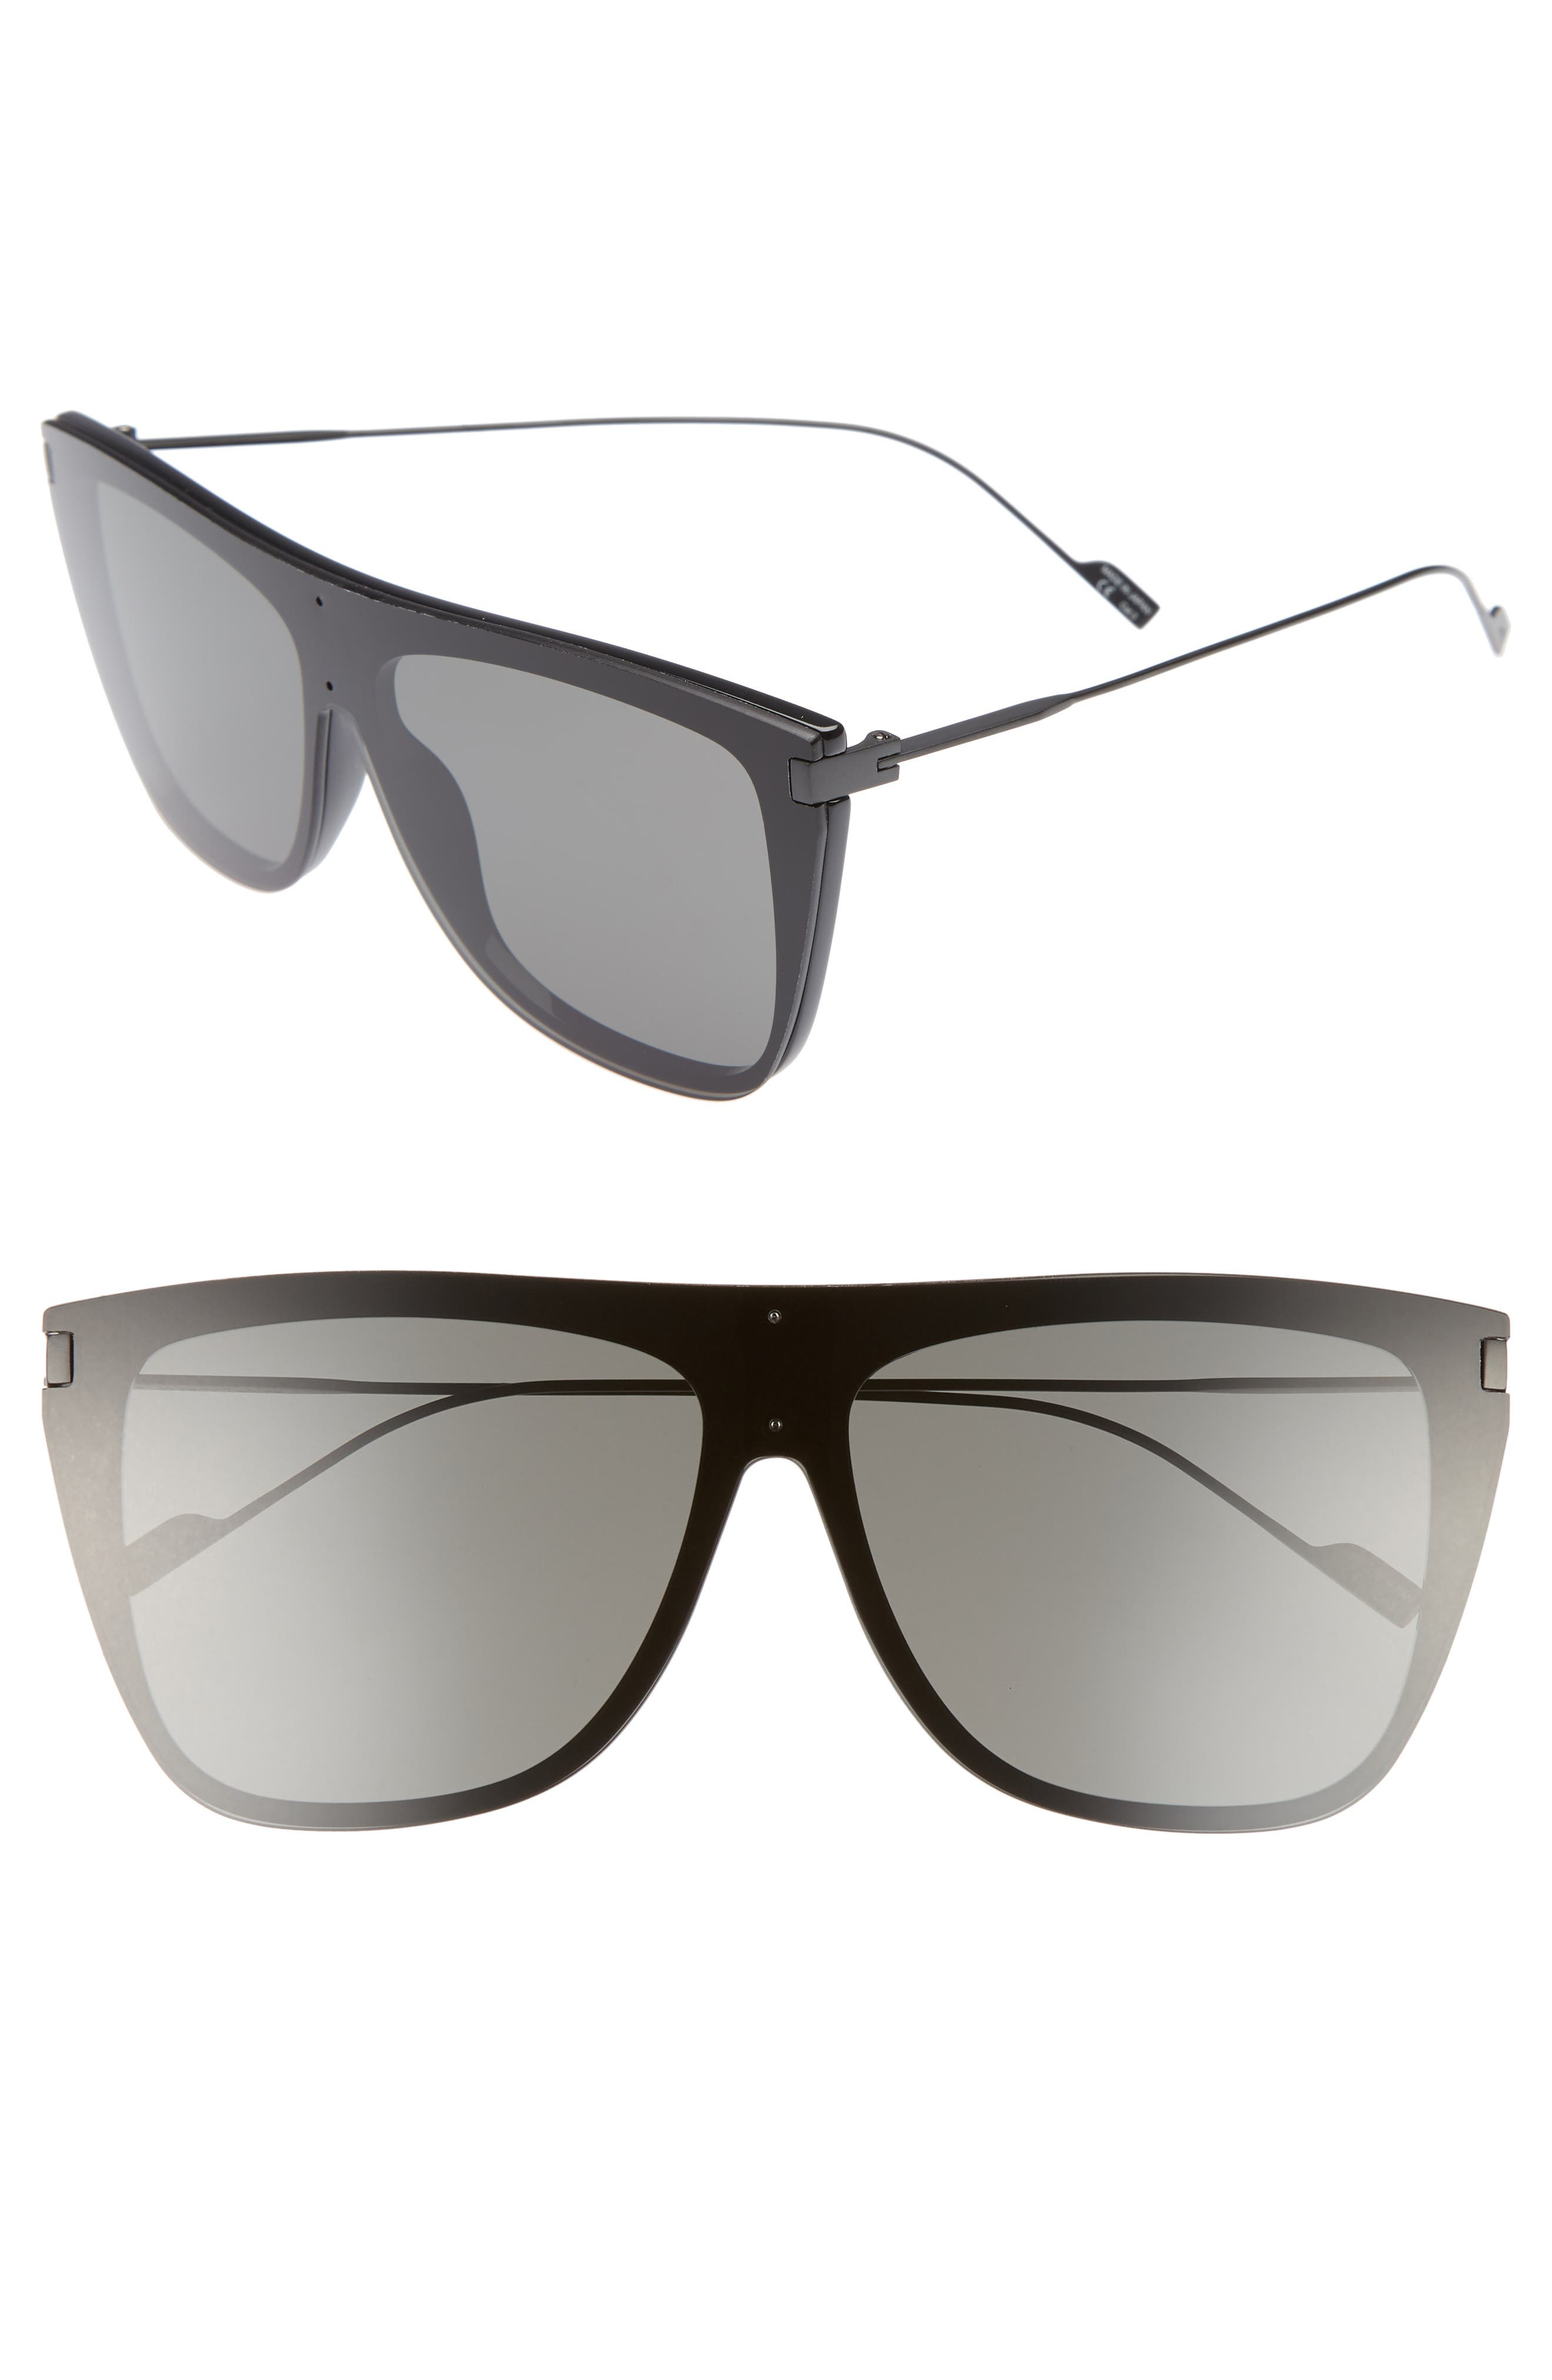 SAINT LAURENT SL 1 T 59mm Flat Top Sunglasses, Main, color, BLACK